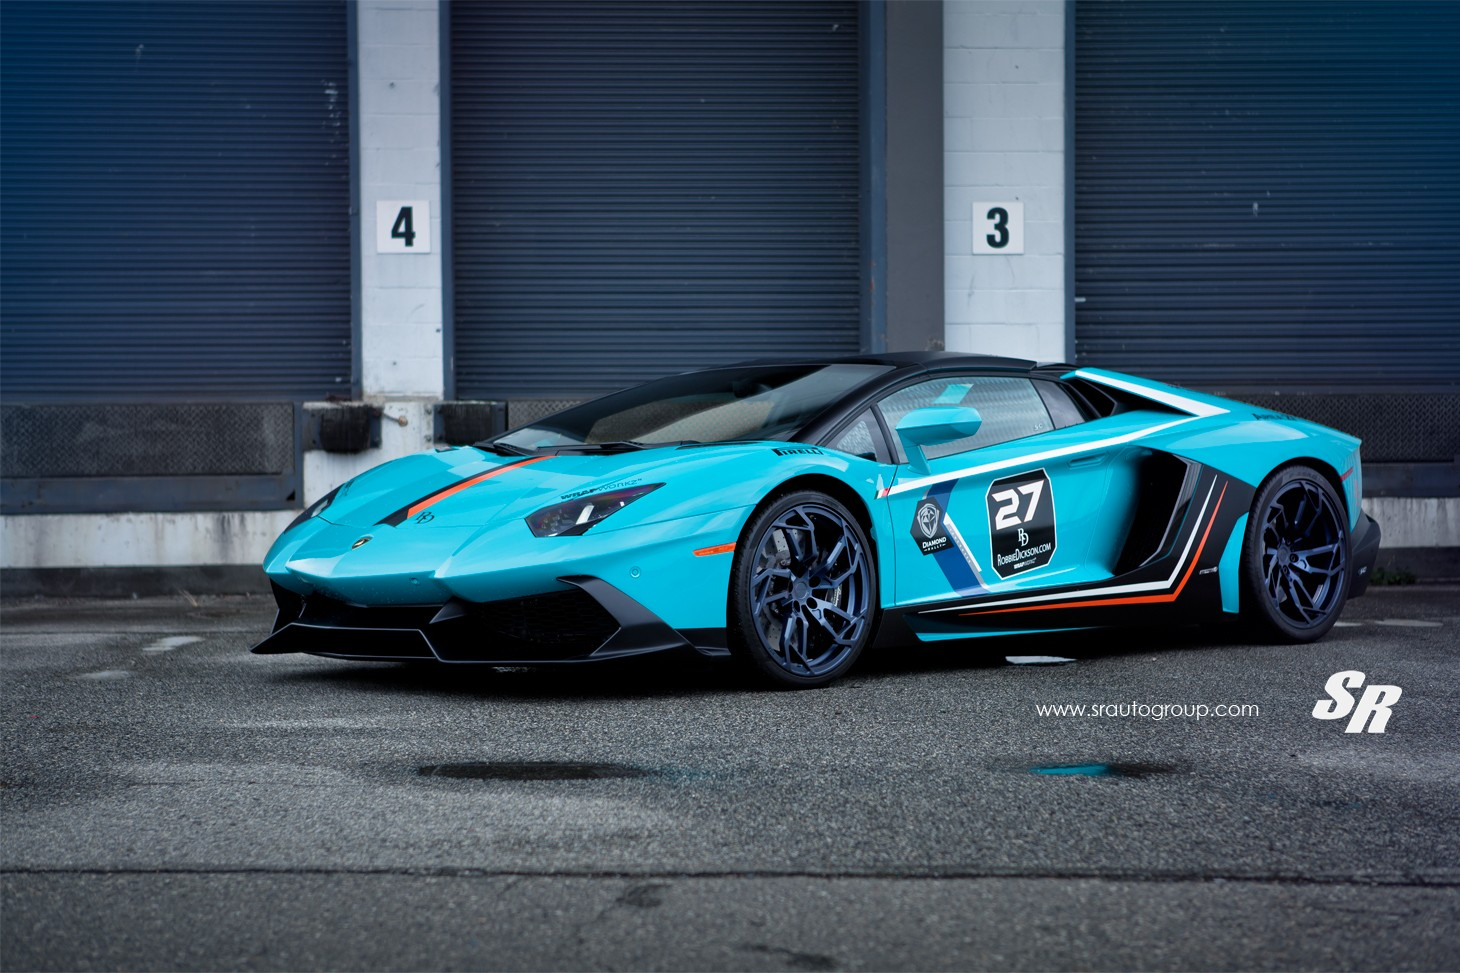 Baby Blue Lamborghini Aventador Gets Pur Wheels Lp720 Body Kit Autoevolution